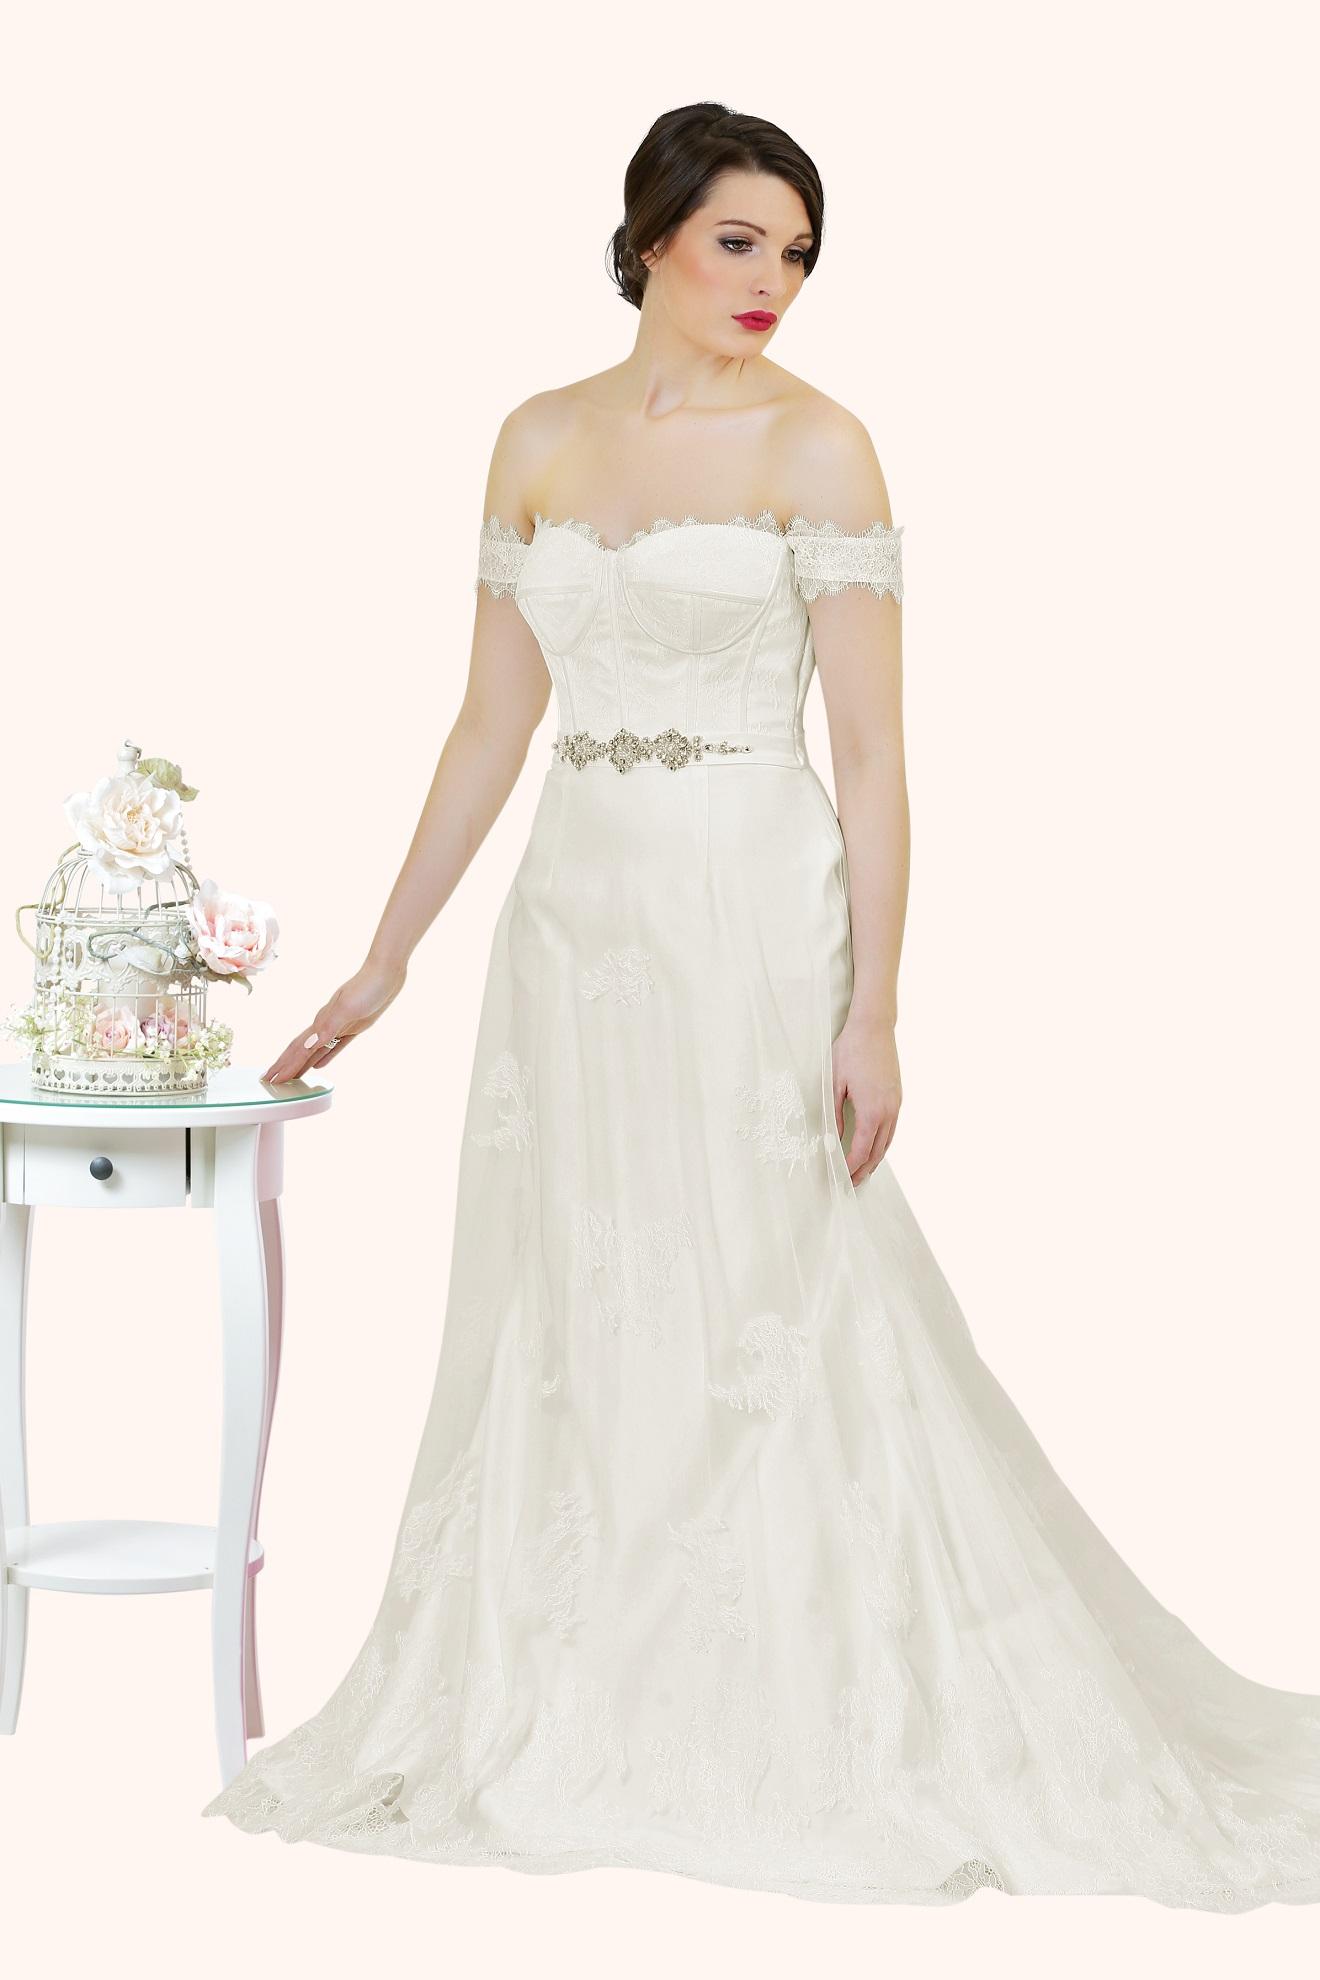 sample wedding dresses sale online uk wedding dress sale online Sample Wedding Dresses Sale Online Uk 98